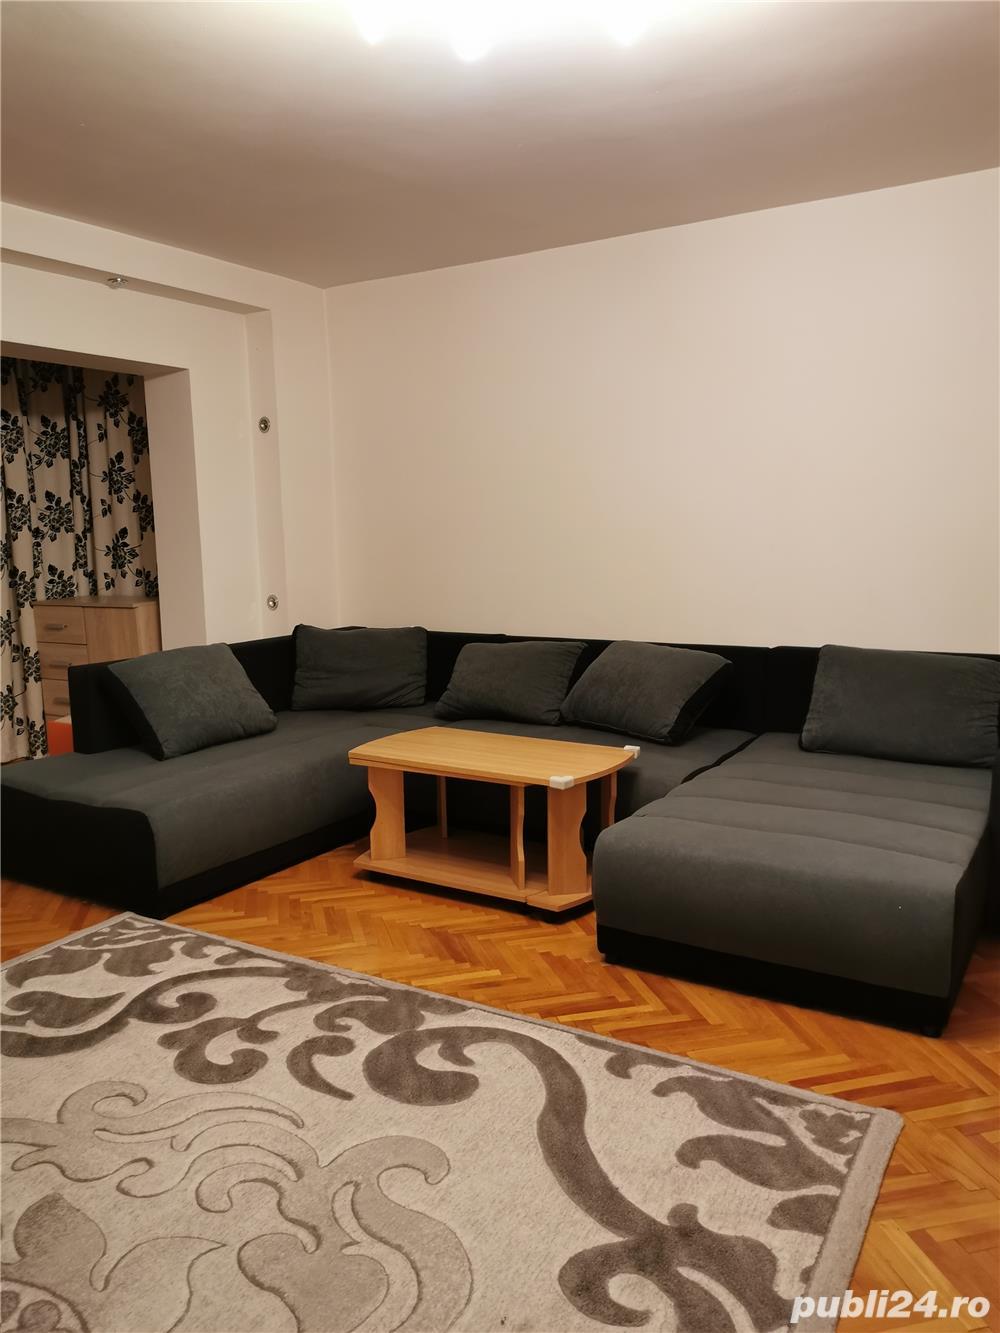 Zona Bucovina vecin Beauty Center cu centrala gaz - ambient plăcut